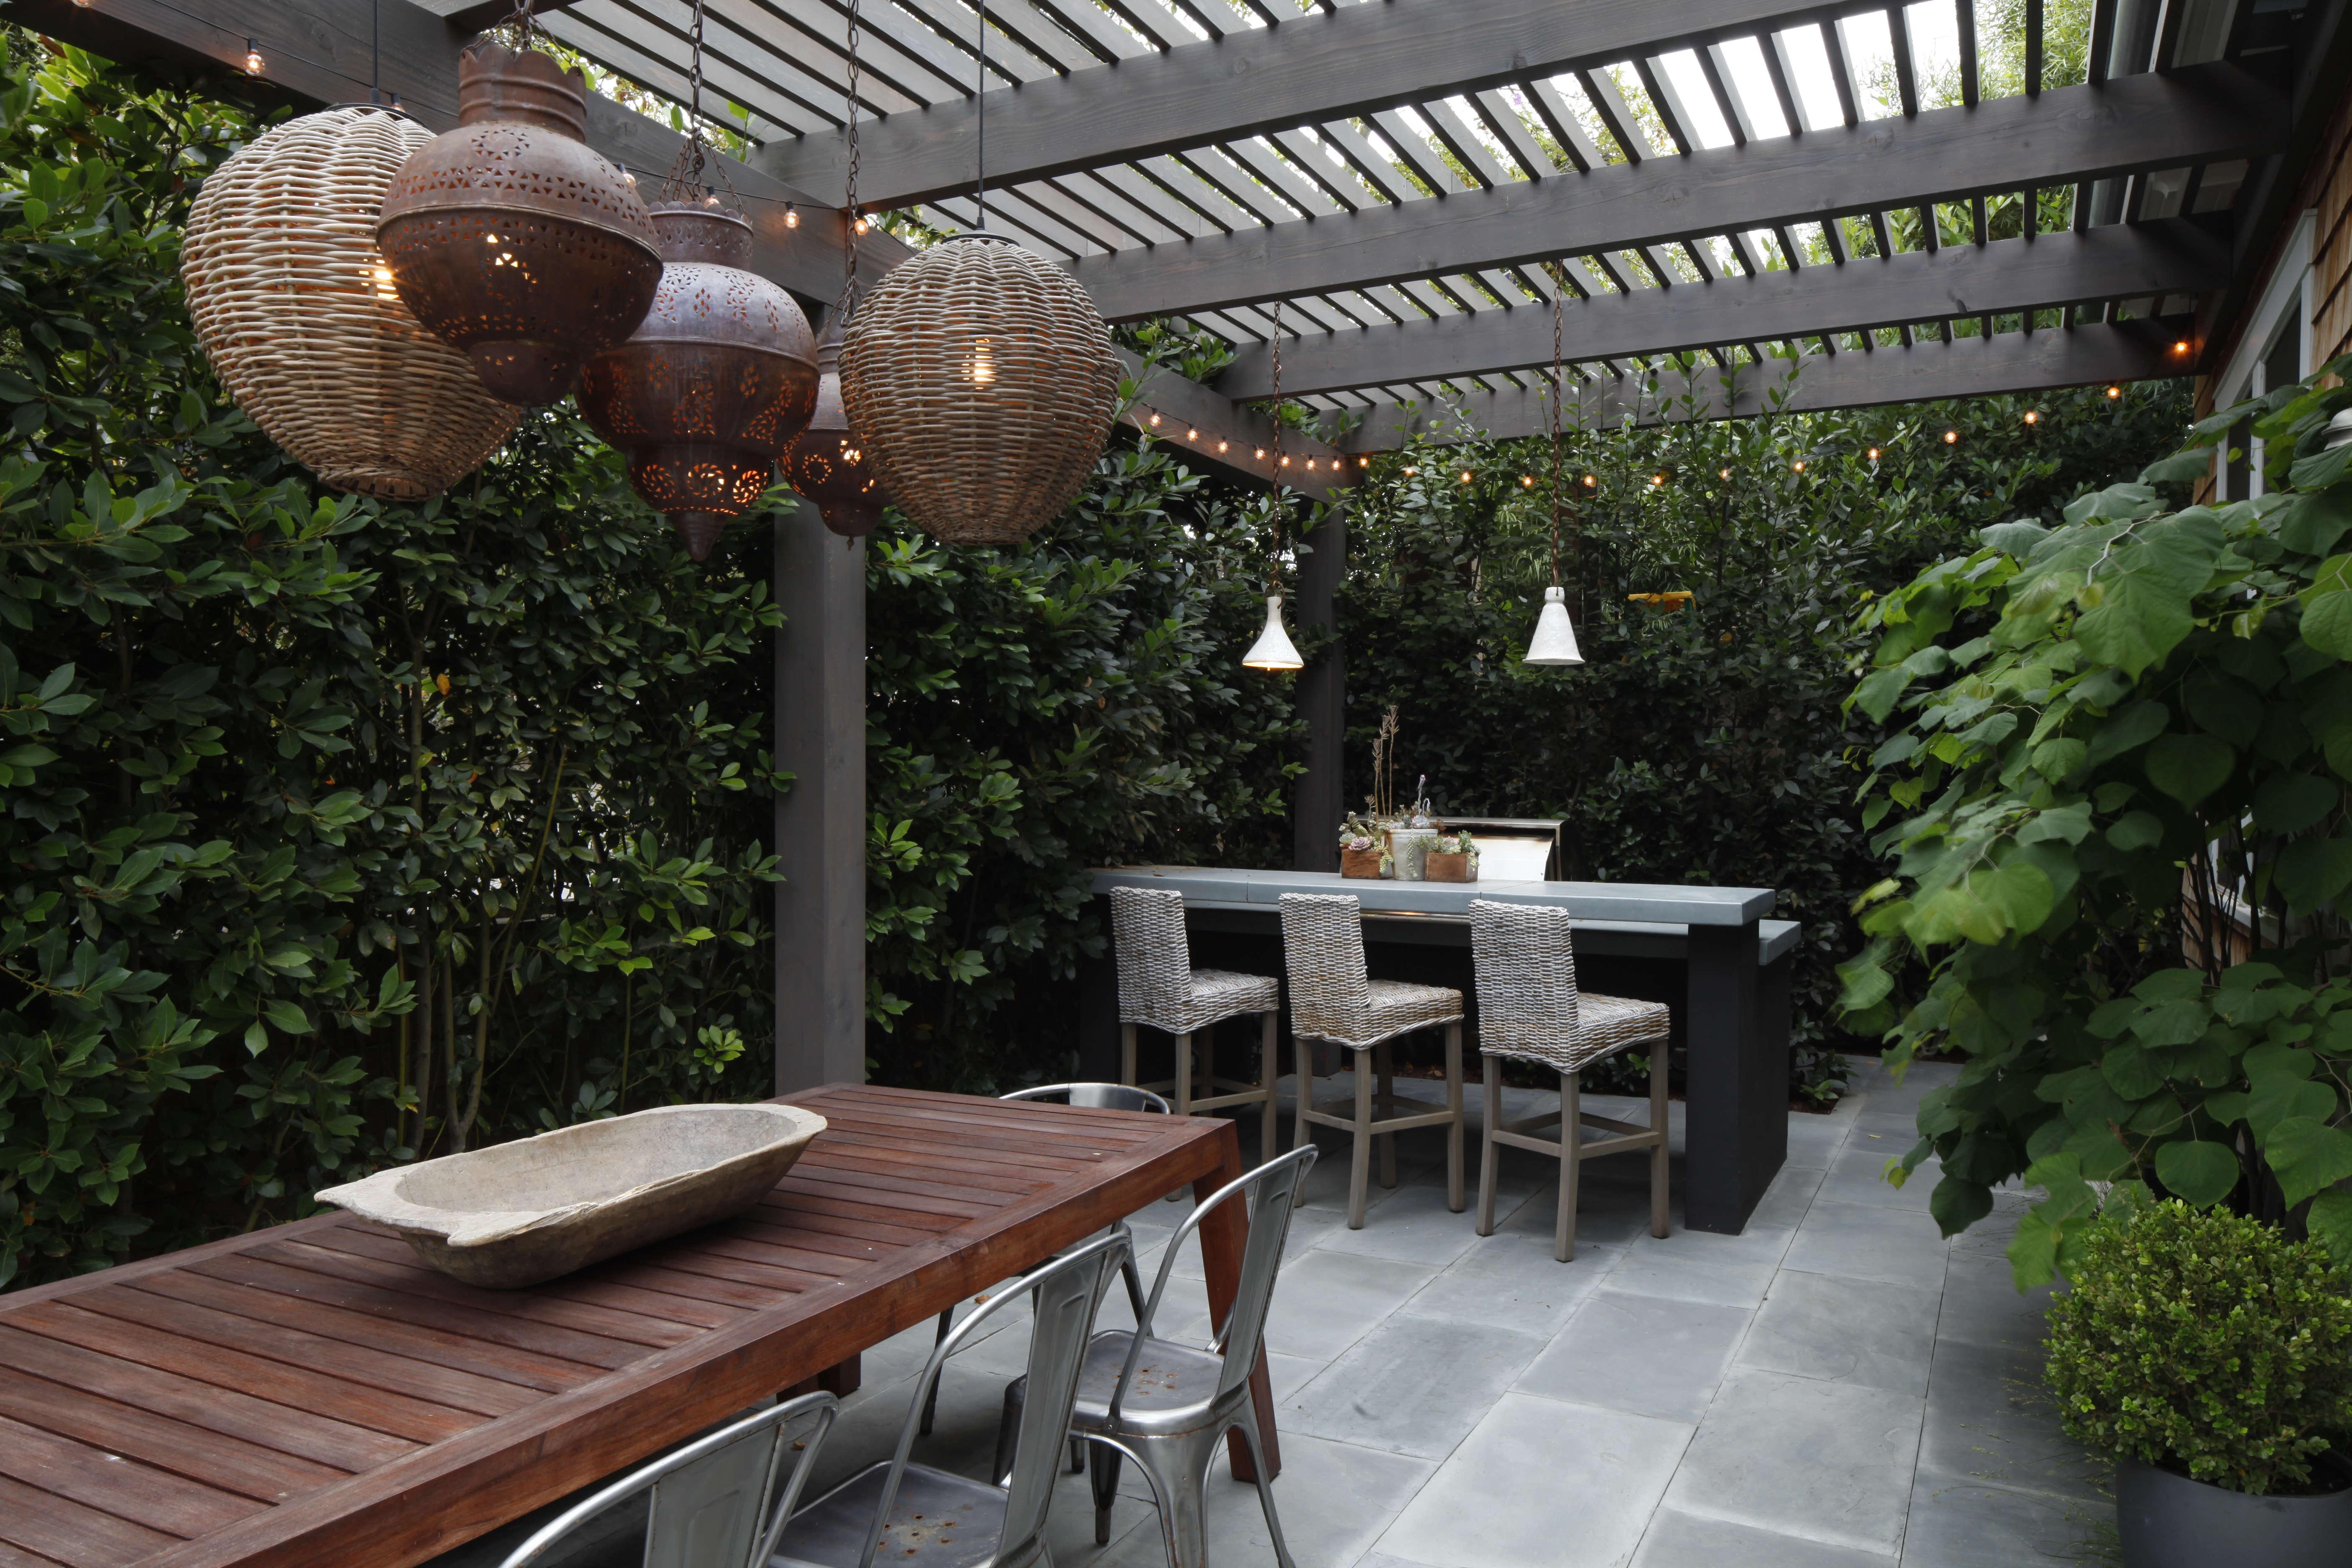 Mark-Tessier-pacific-palisades-garden-pergola-lanterns-dining-table